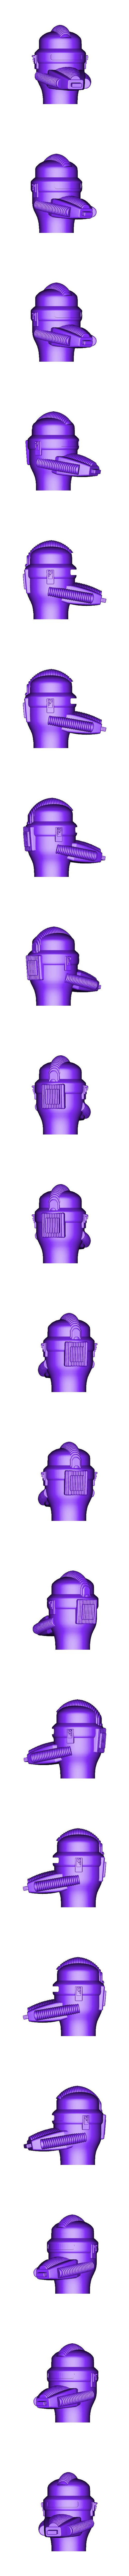 Breen_v1_whole.stl Download free STL file Breen Helmet • 3D printer template, poblocki1982